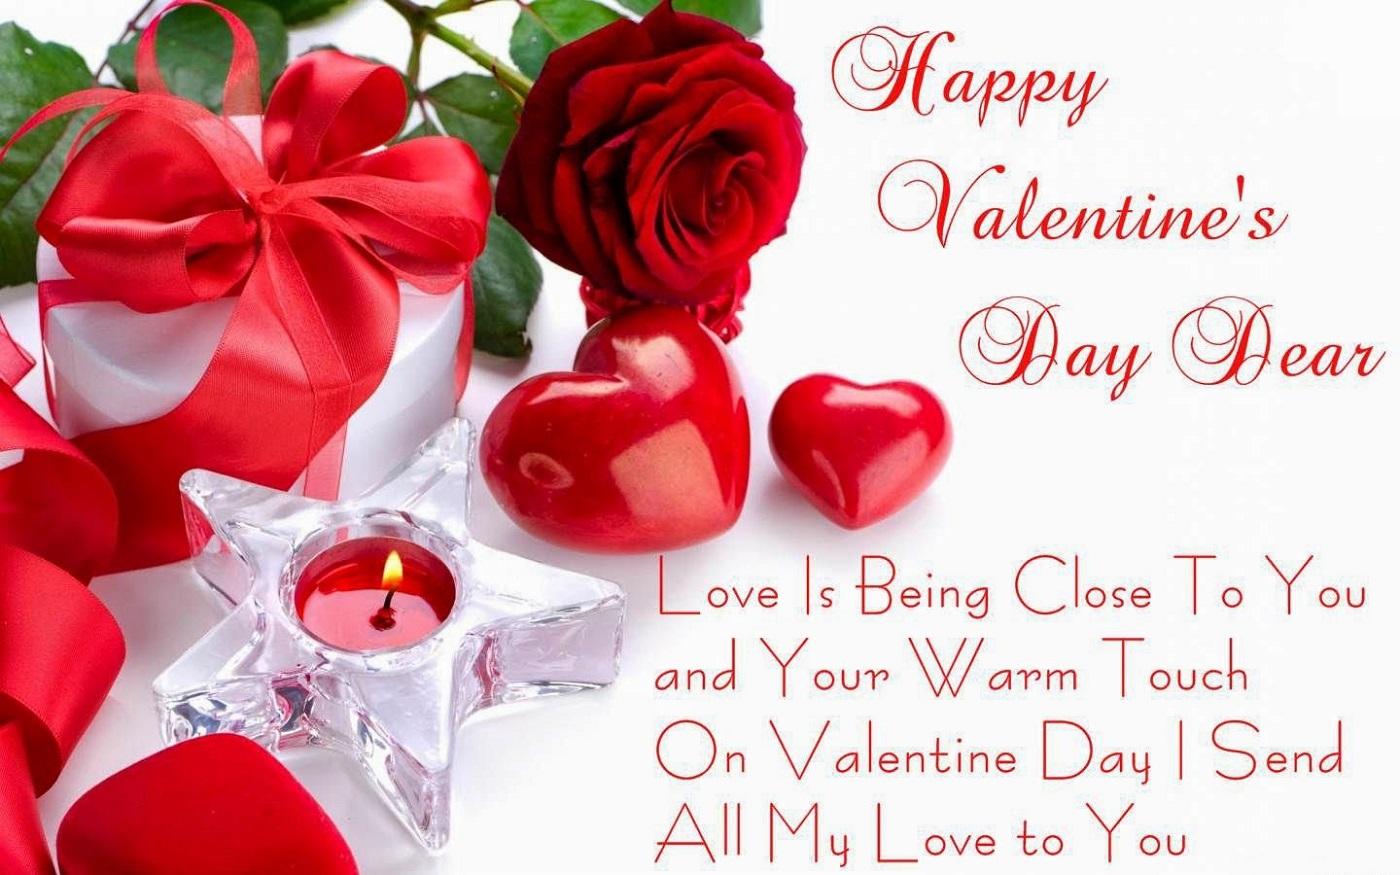 Valentines Day Quotes For Girlfriend Valentine Day 2018 Sms In Hindi For Girlfriend  Happy Valentines